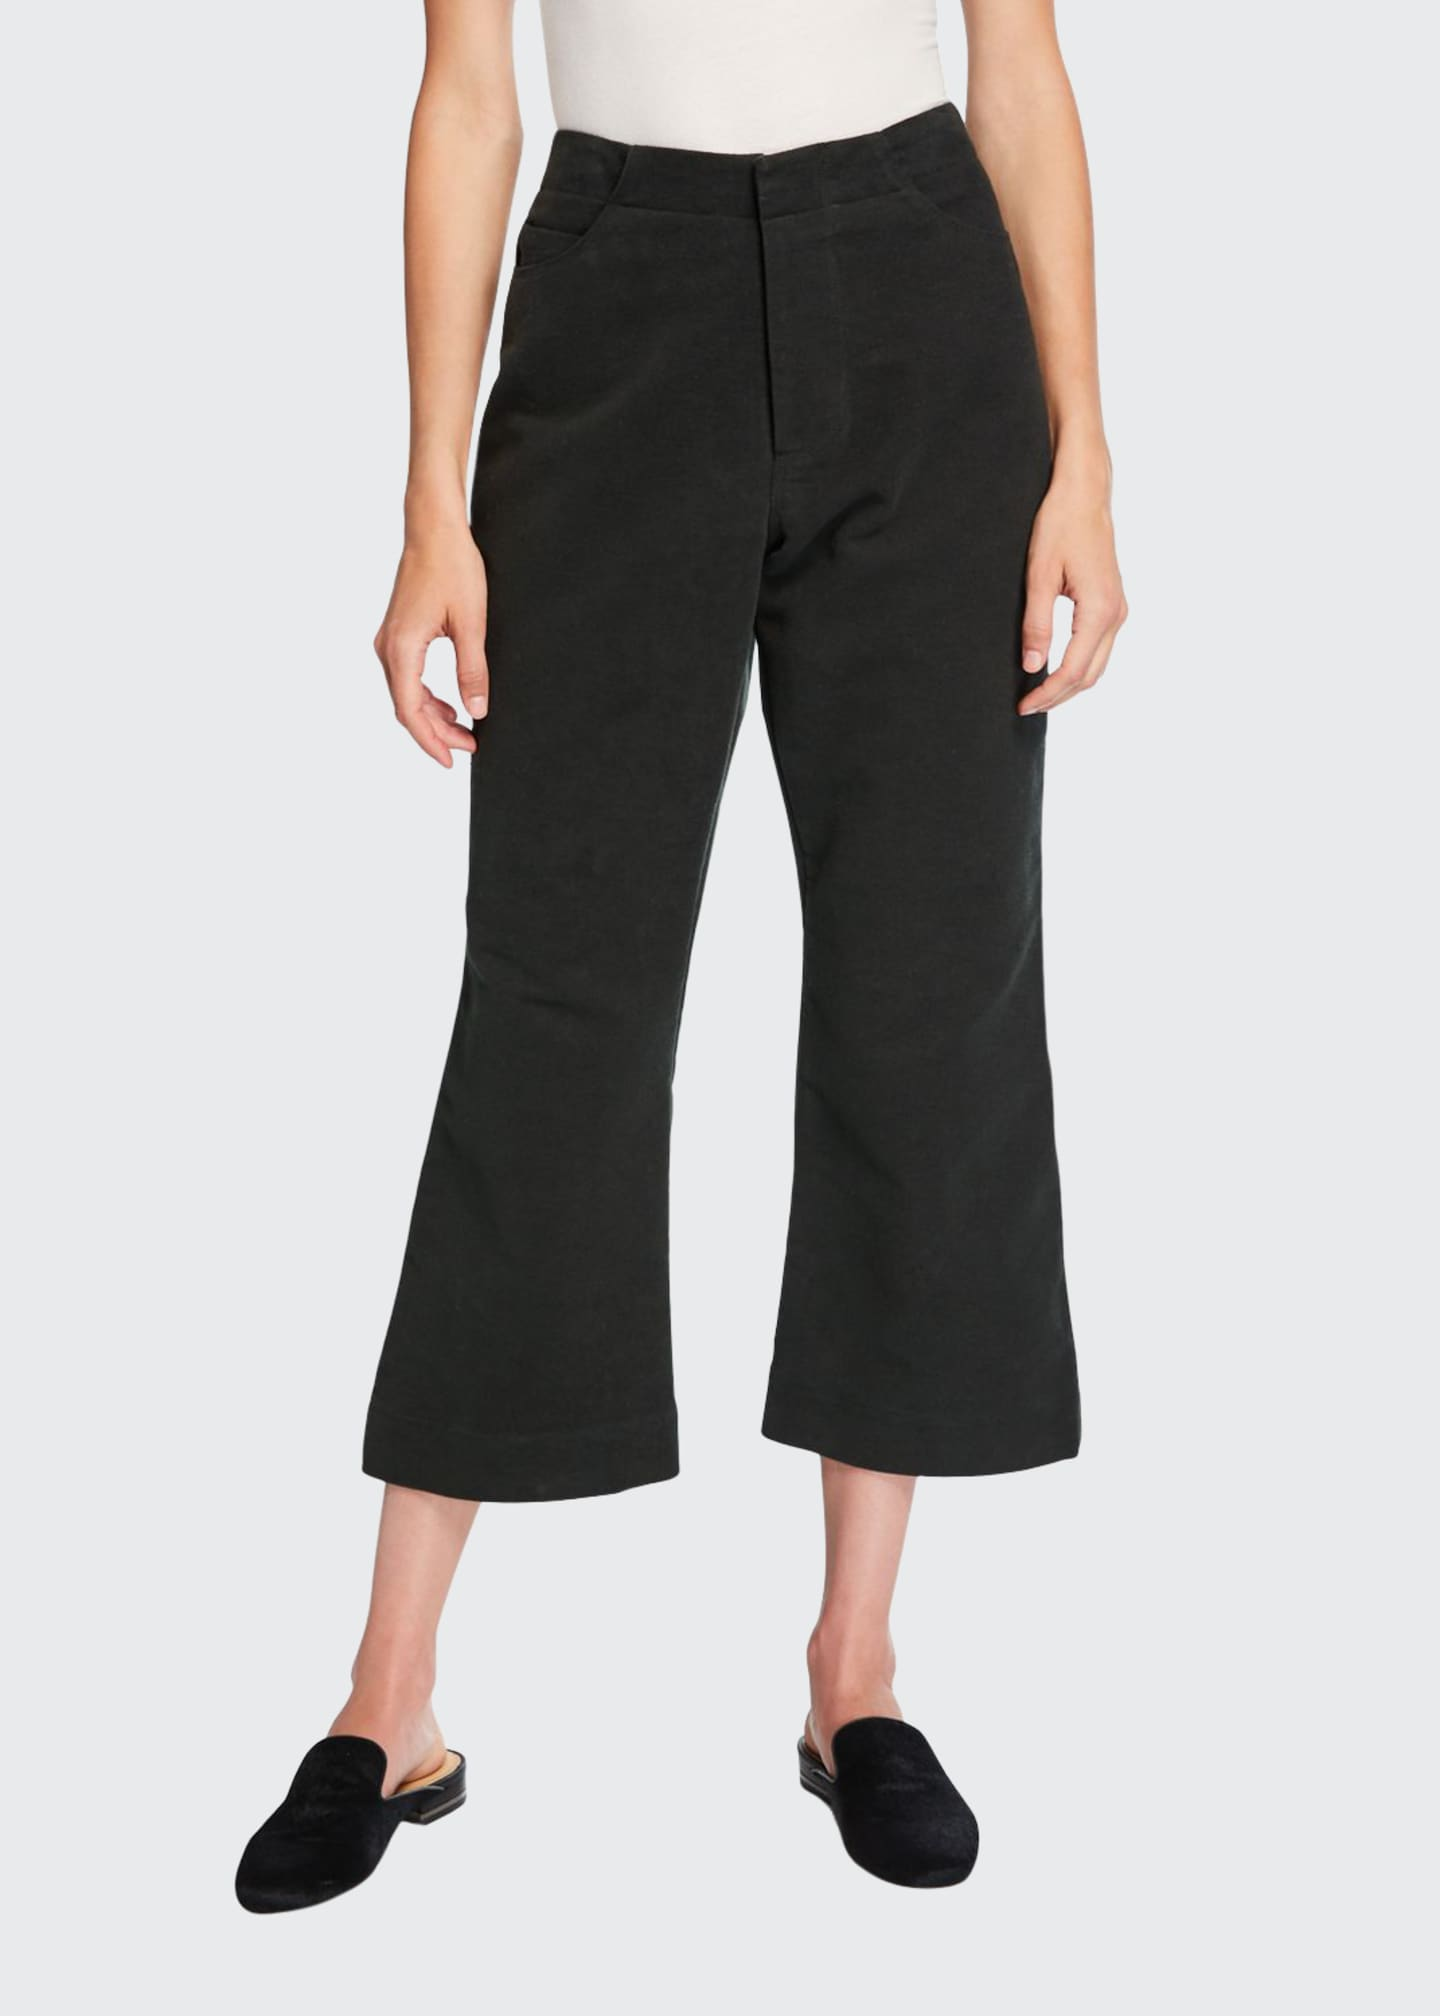 Deveaux New York Cropped Flare-Leg Brushed Moleskin Pants